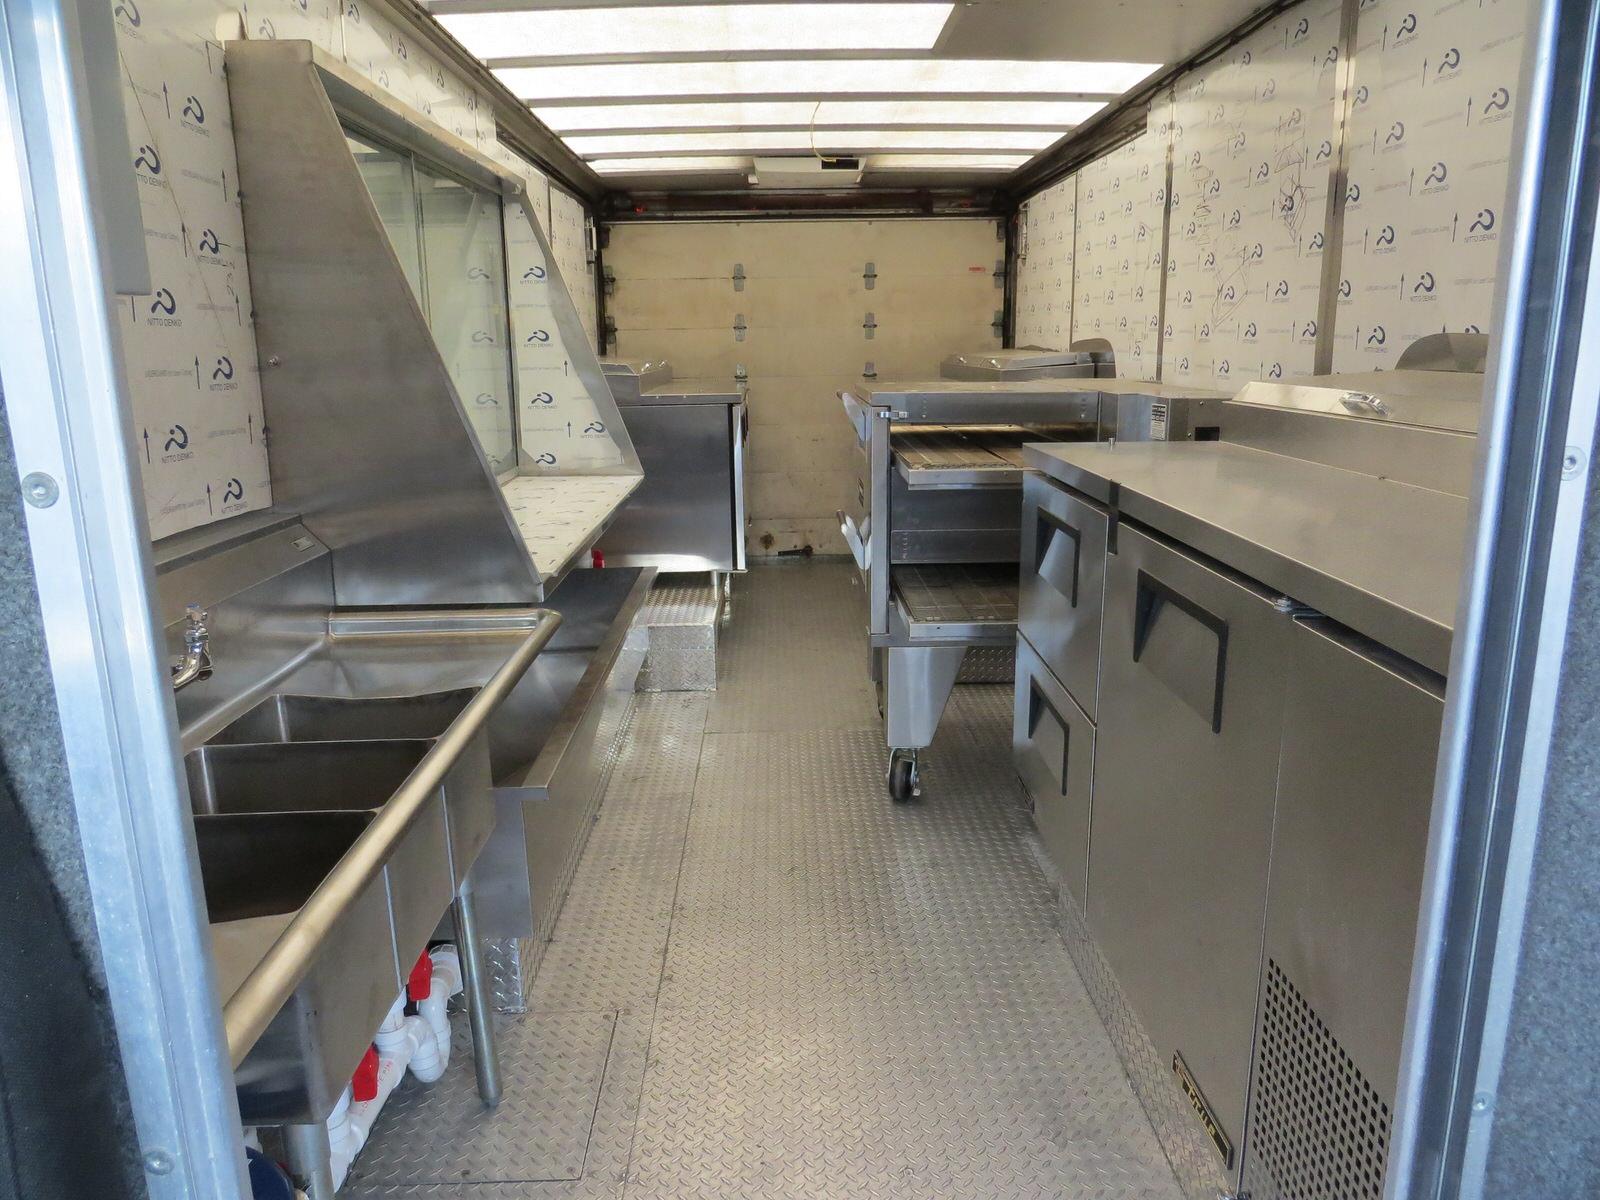 The Brozinni Pizzeria food truck's interior features custom aluminum diamond tread floor plating and much more.